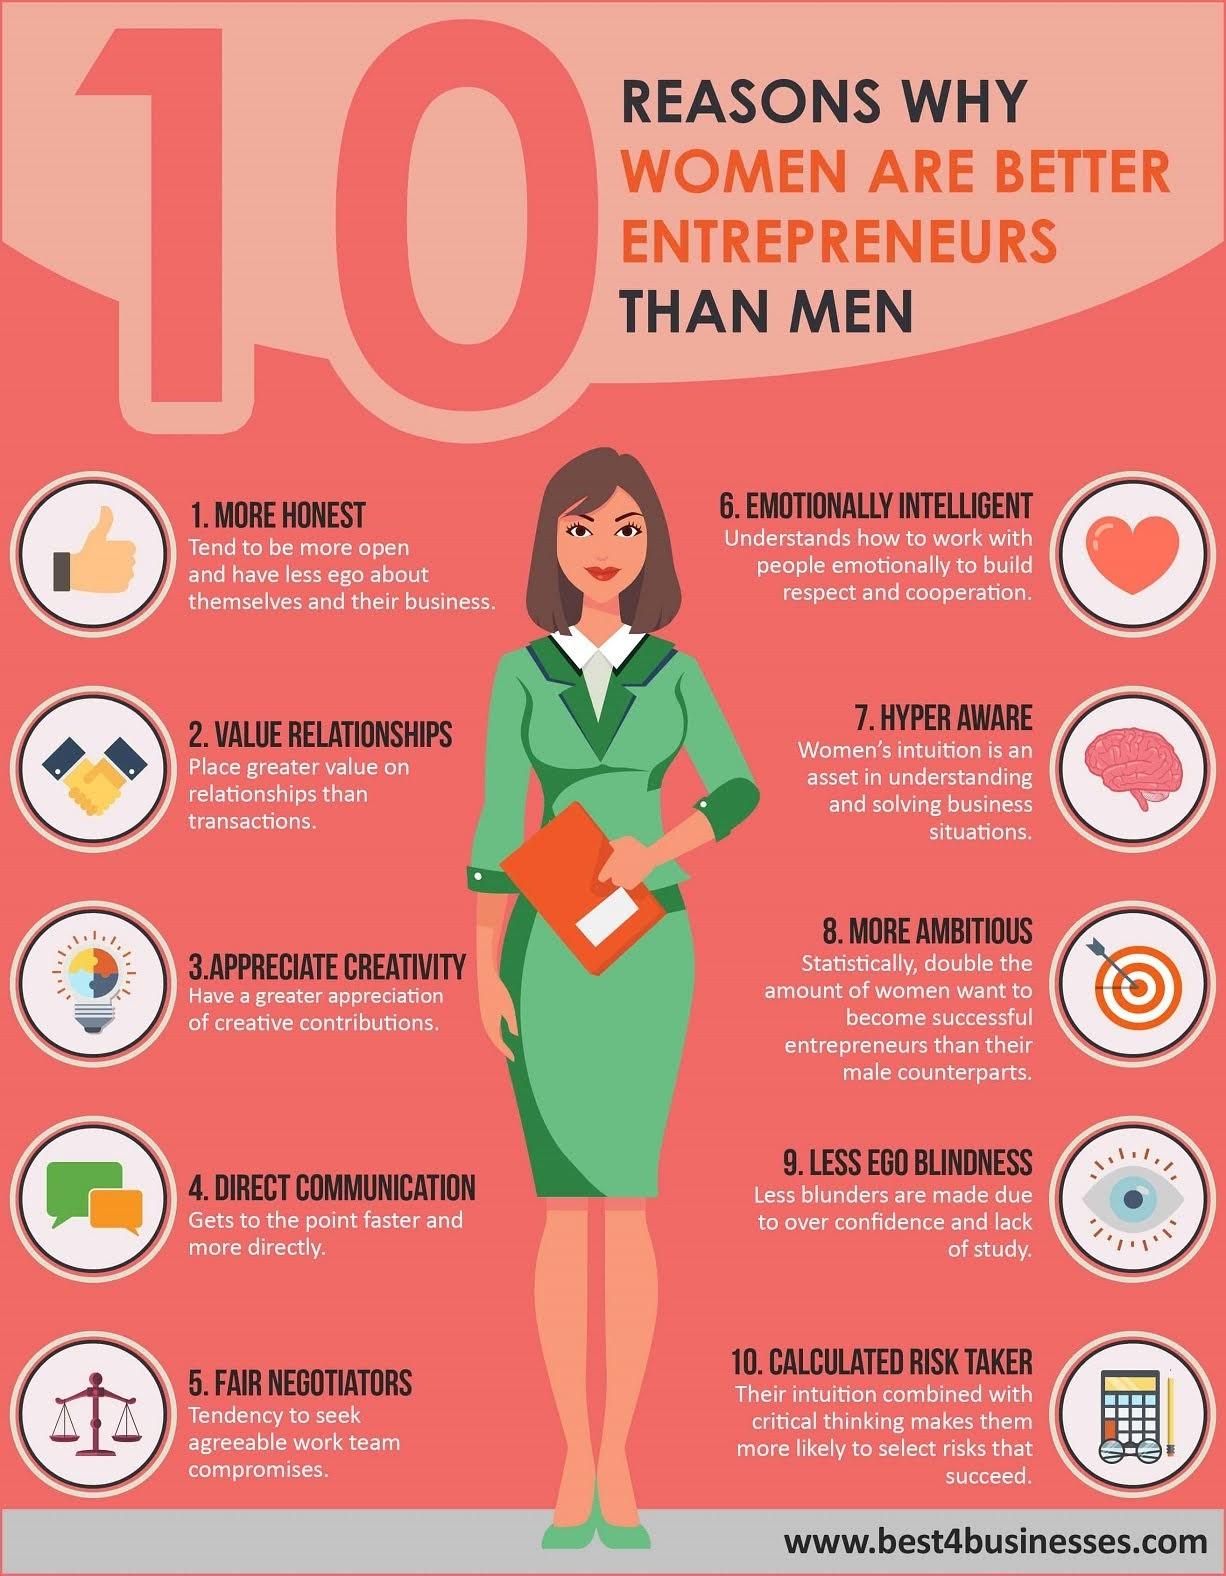 10 Reasons Why Women Are Better Entrepreneurs than Men #infographic